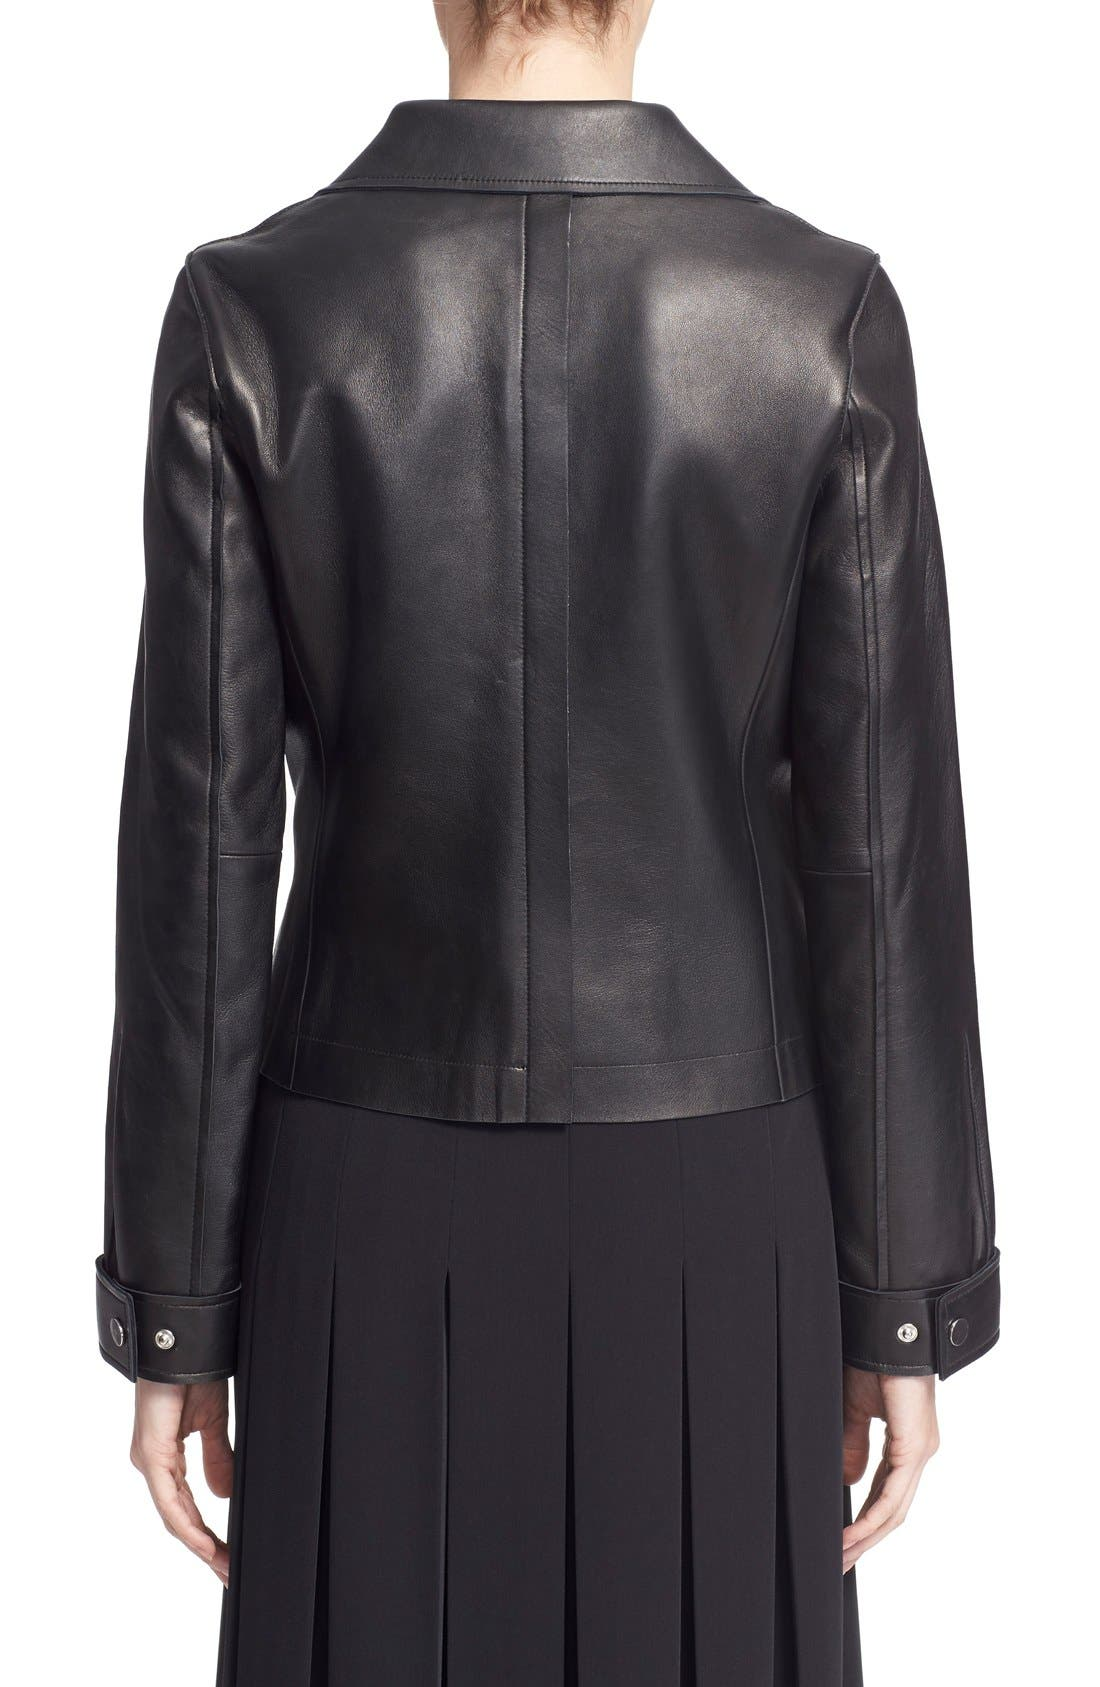 GREY Jason Wu Lambskin Leather Jacket,                             Alternate thumbnail 5, color,                             015